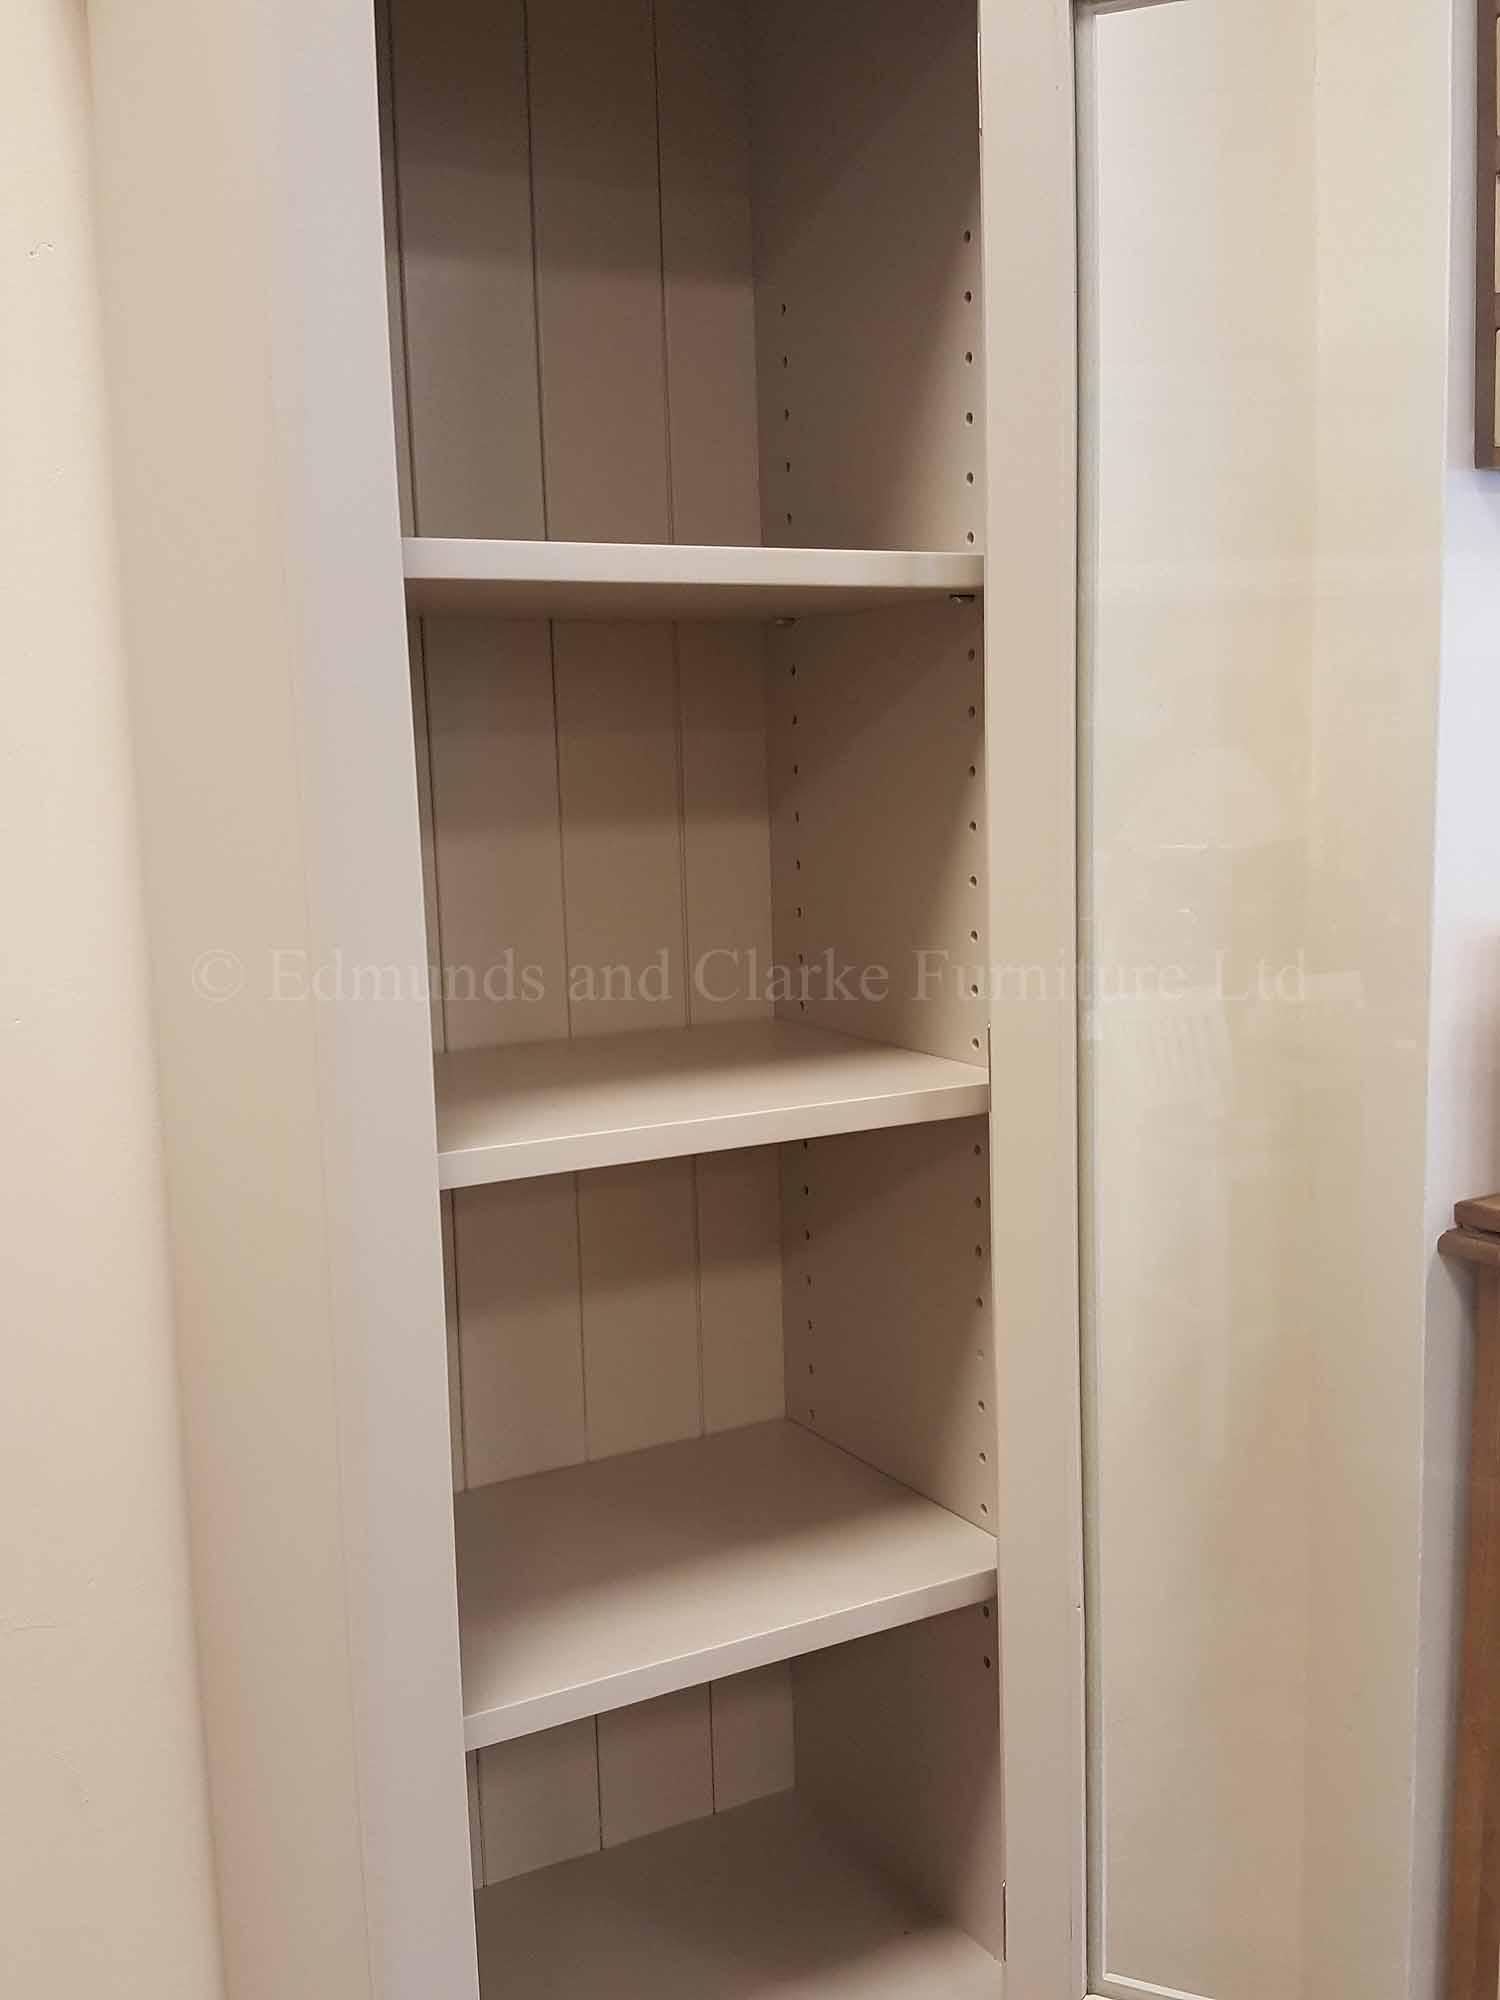 Tall narrow kitchen cupboard with glass door